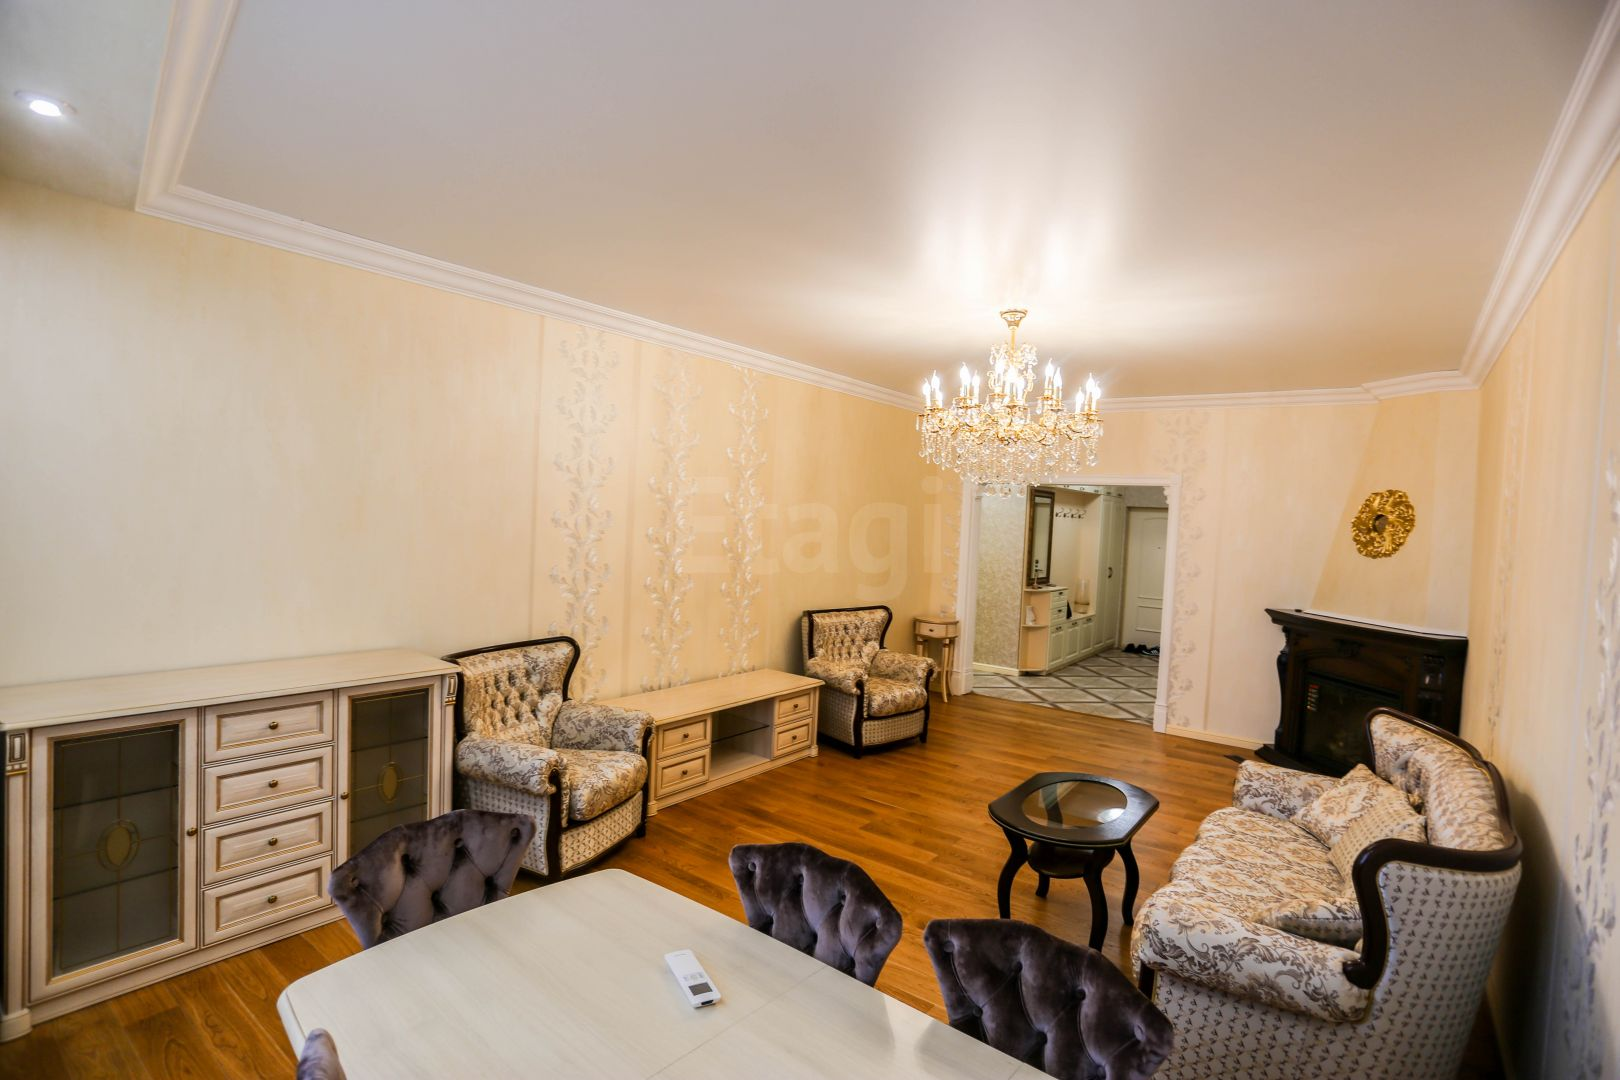 Продается четырехкомнатная квартира за 16 000 000 рублей. ЗИП, ул. Московская (4.7 км до центра).